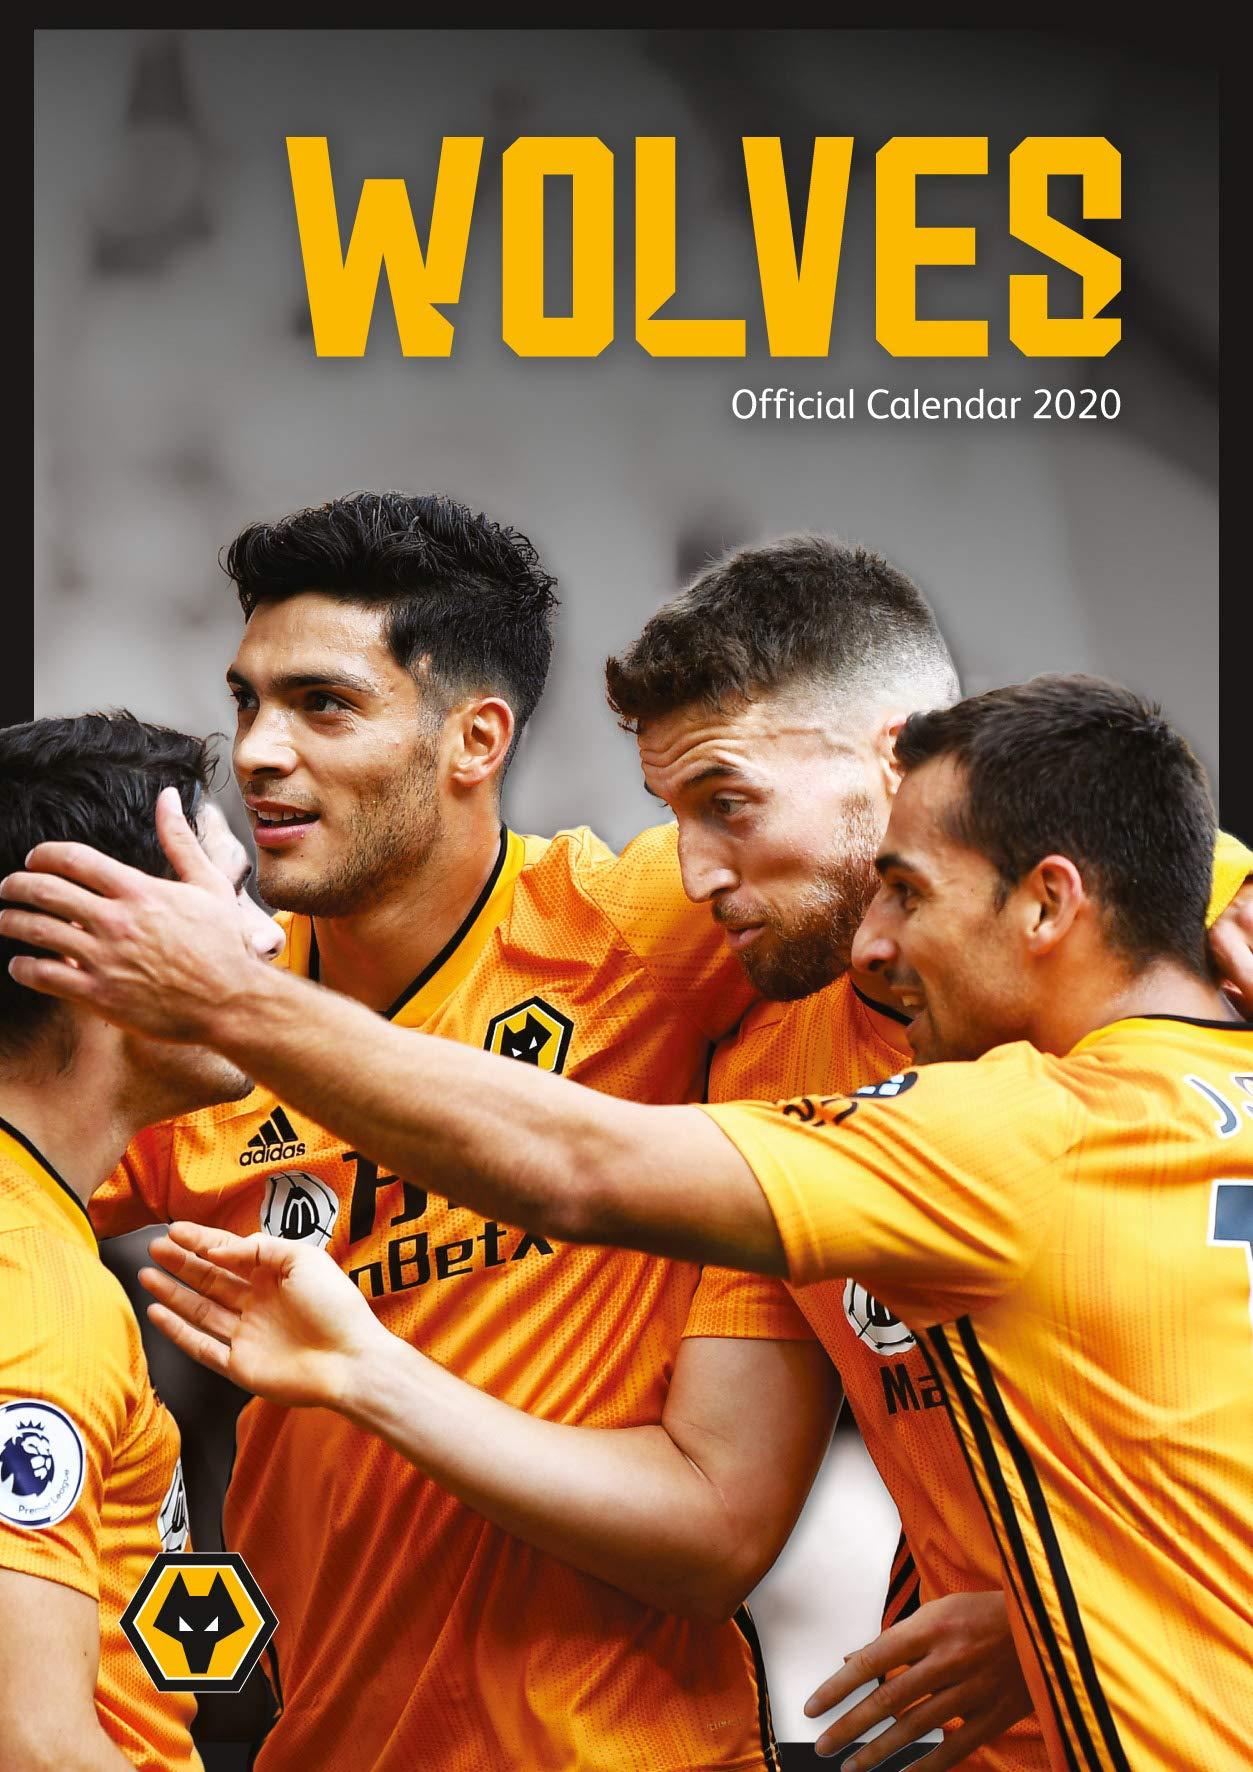 The Official Wolves F C Calendar 2020 Wanderers Wolverhampton 9781913034108 Amazon Com Books